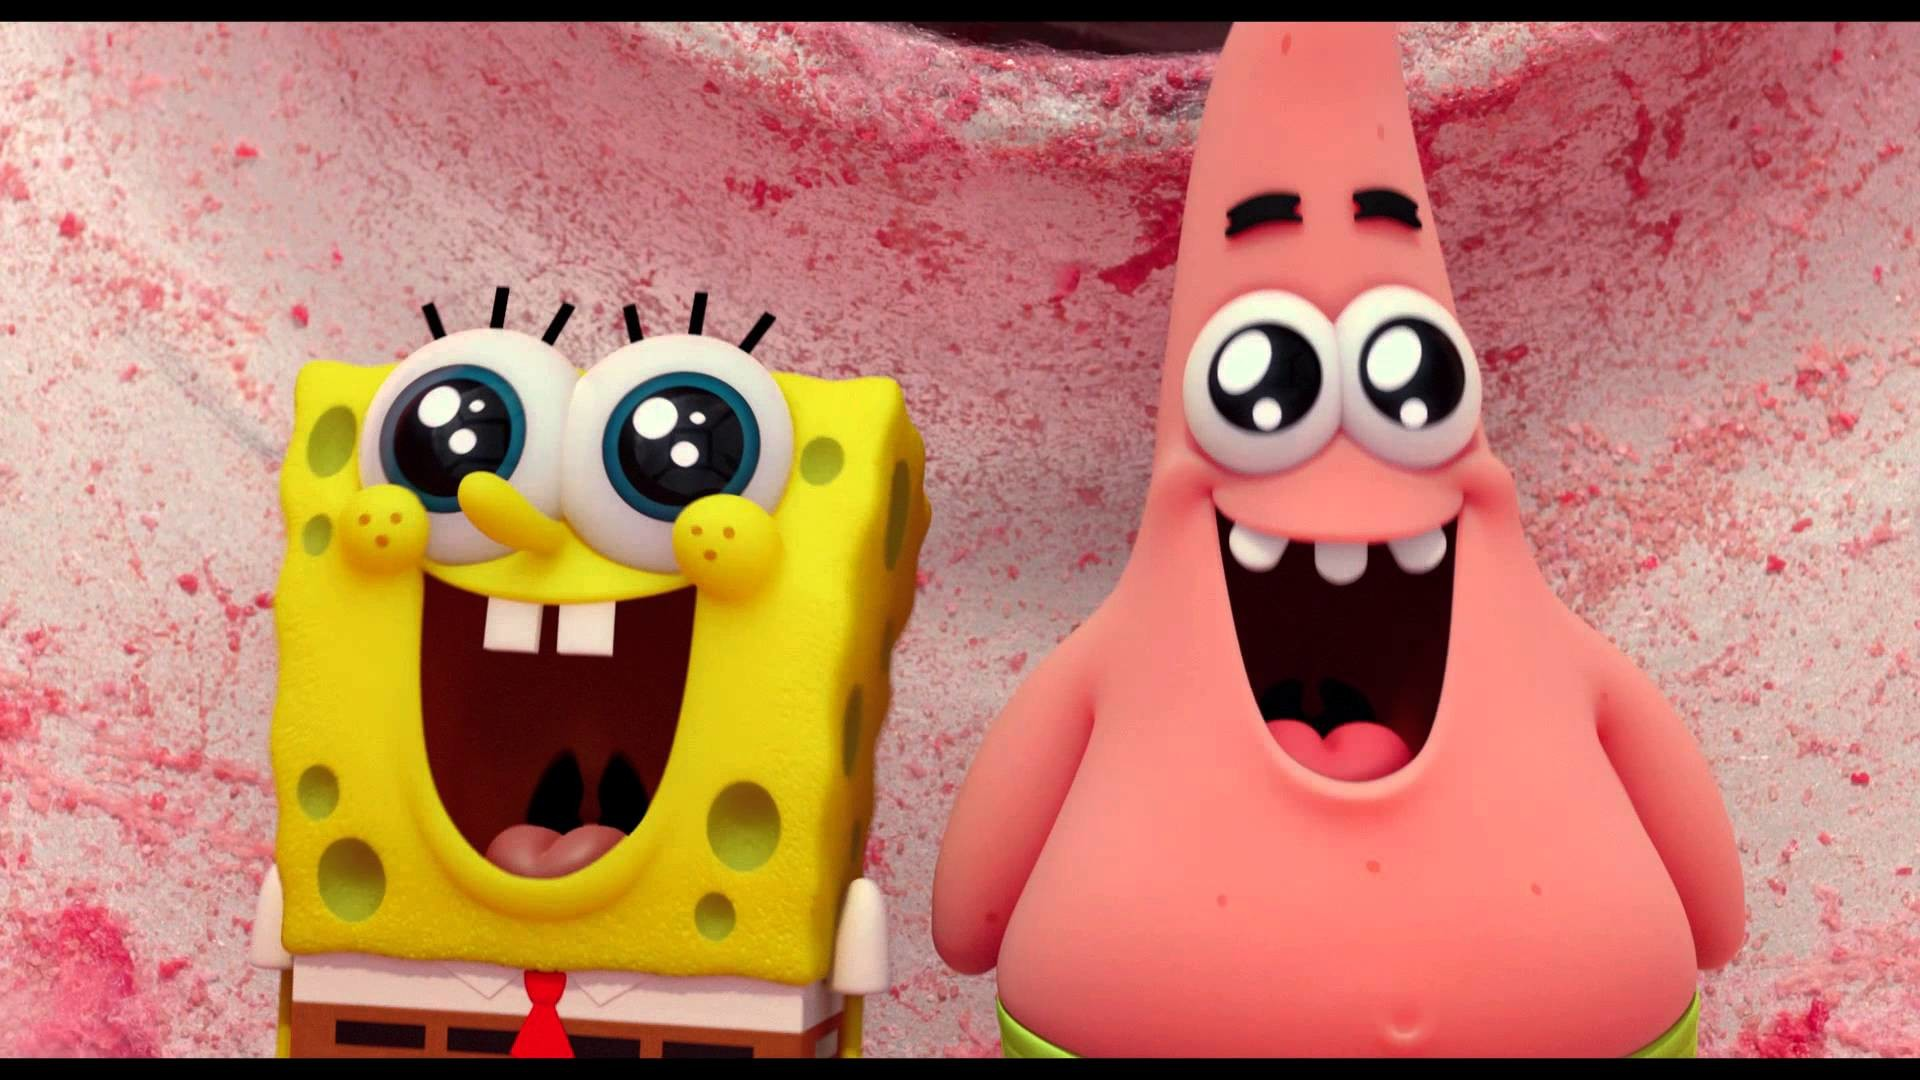 Spongebob Movie Image